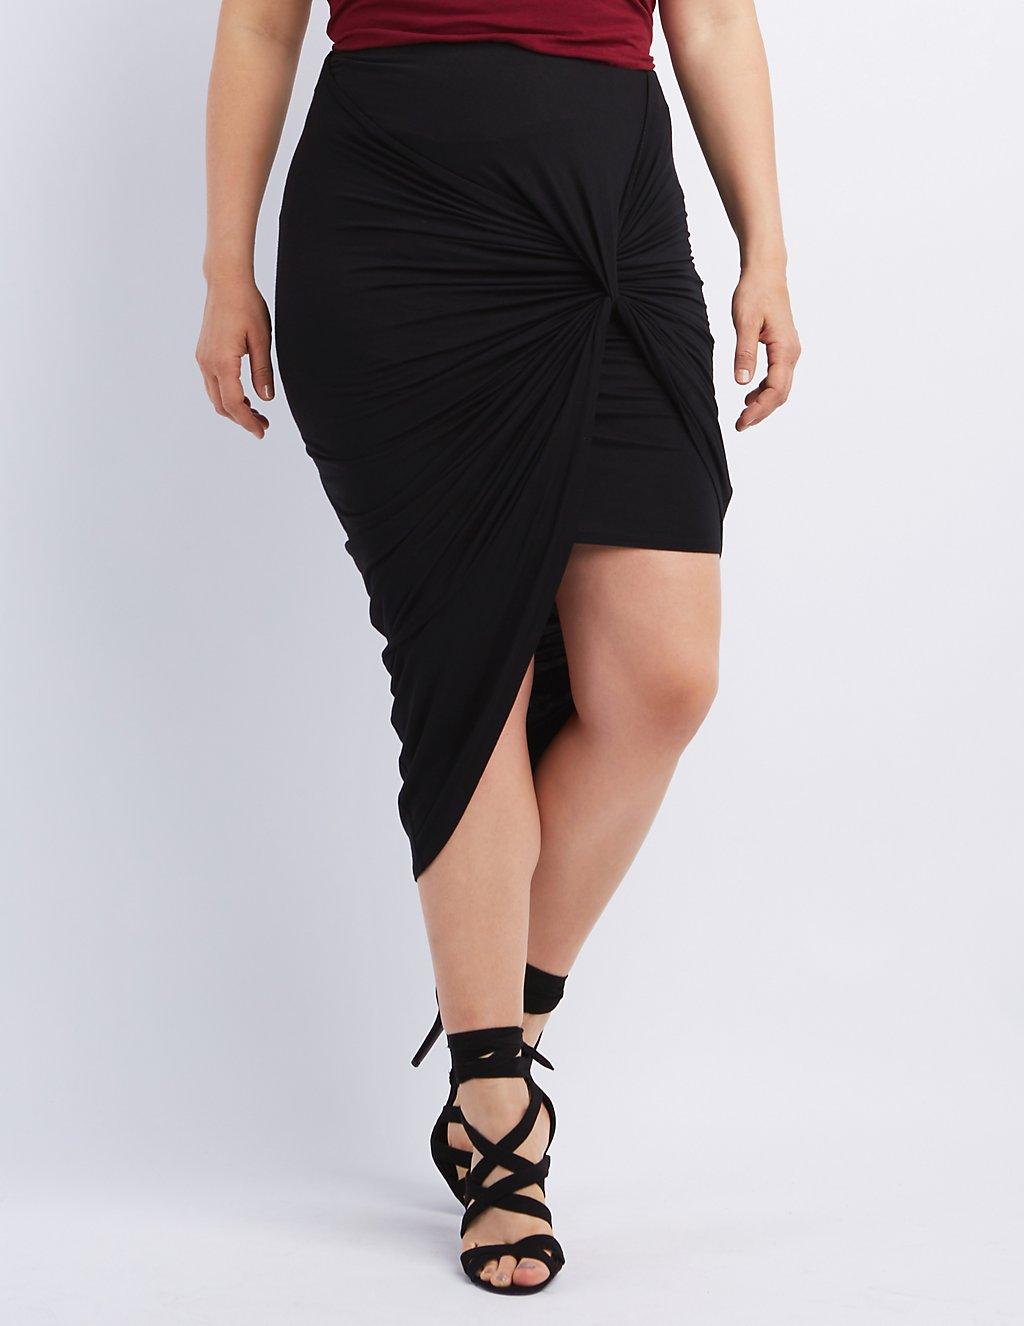 skirt4.jpeg